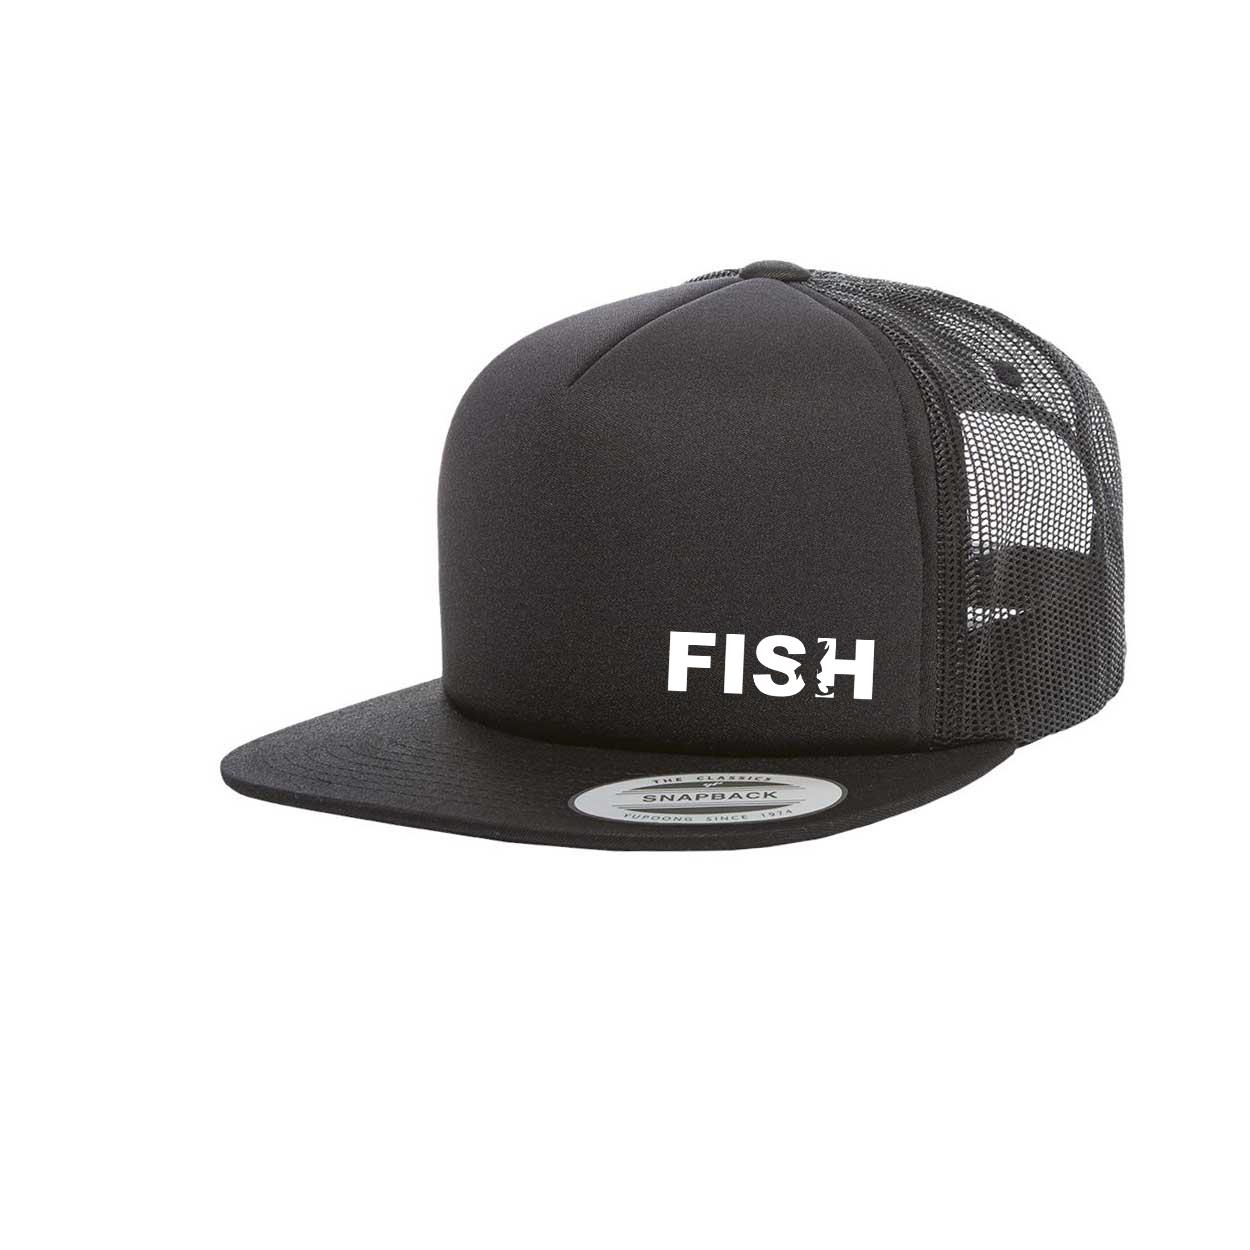 Fish Catch Logo Night Out Premium Foam Flat Brim Snapback Hat Black (White Logo)